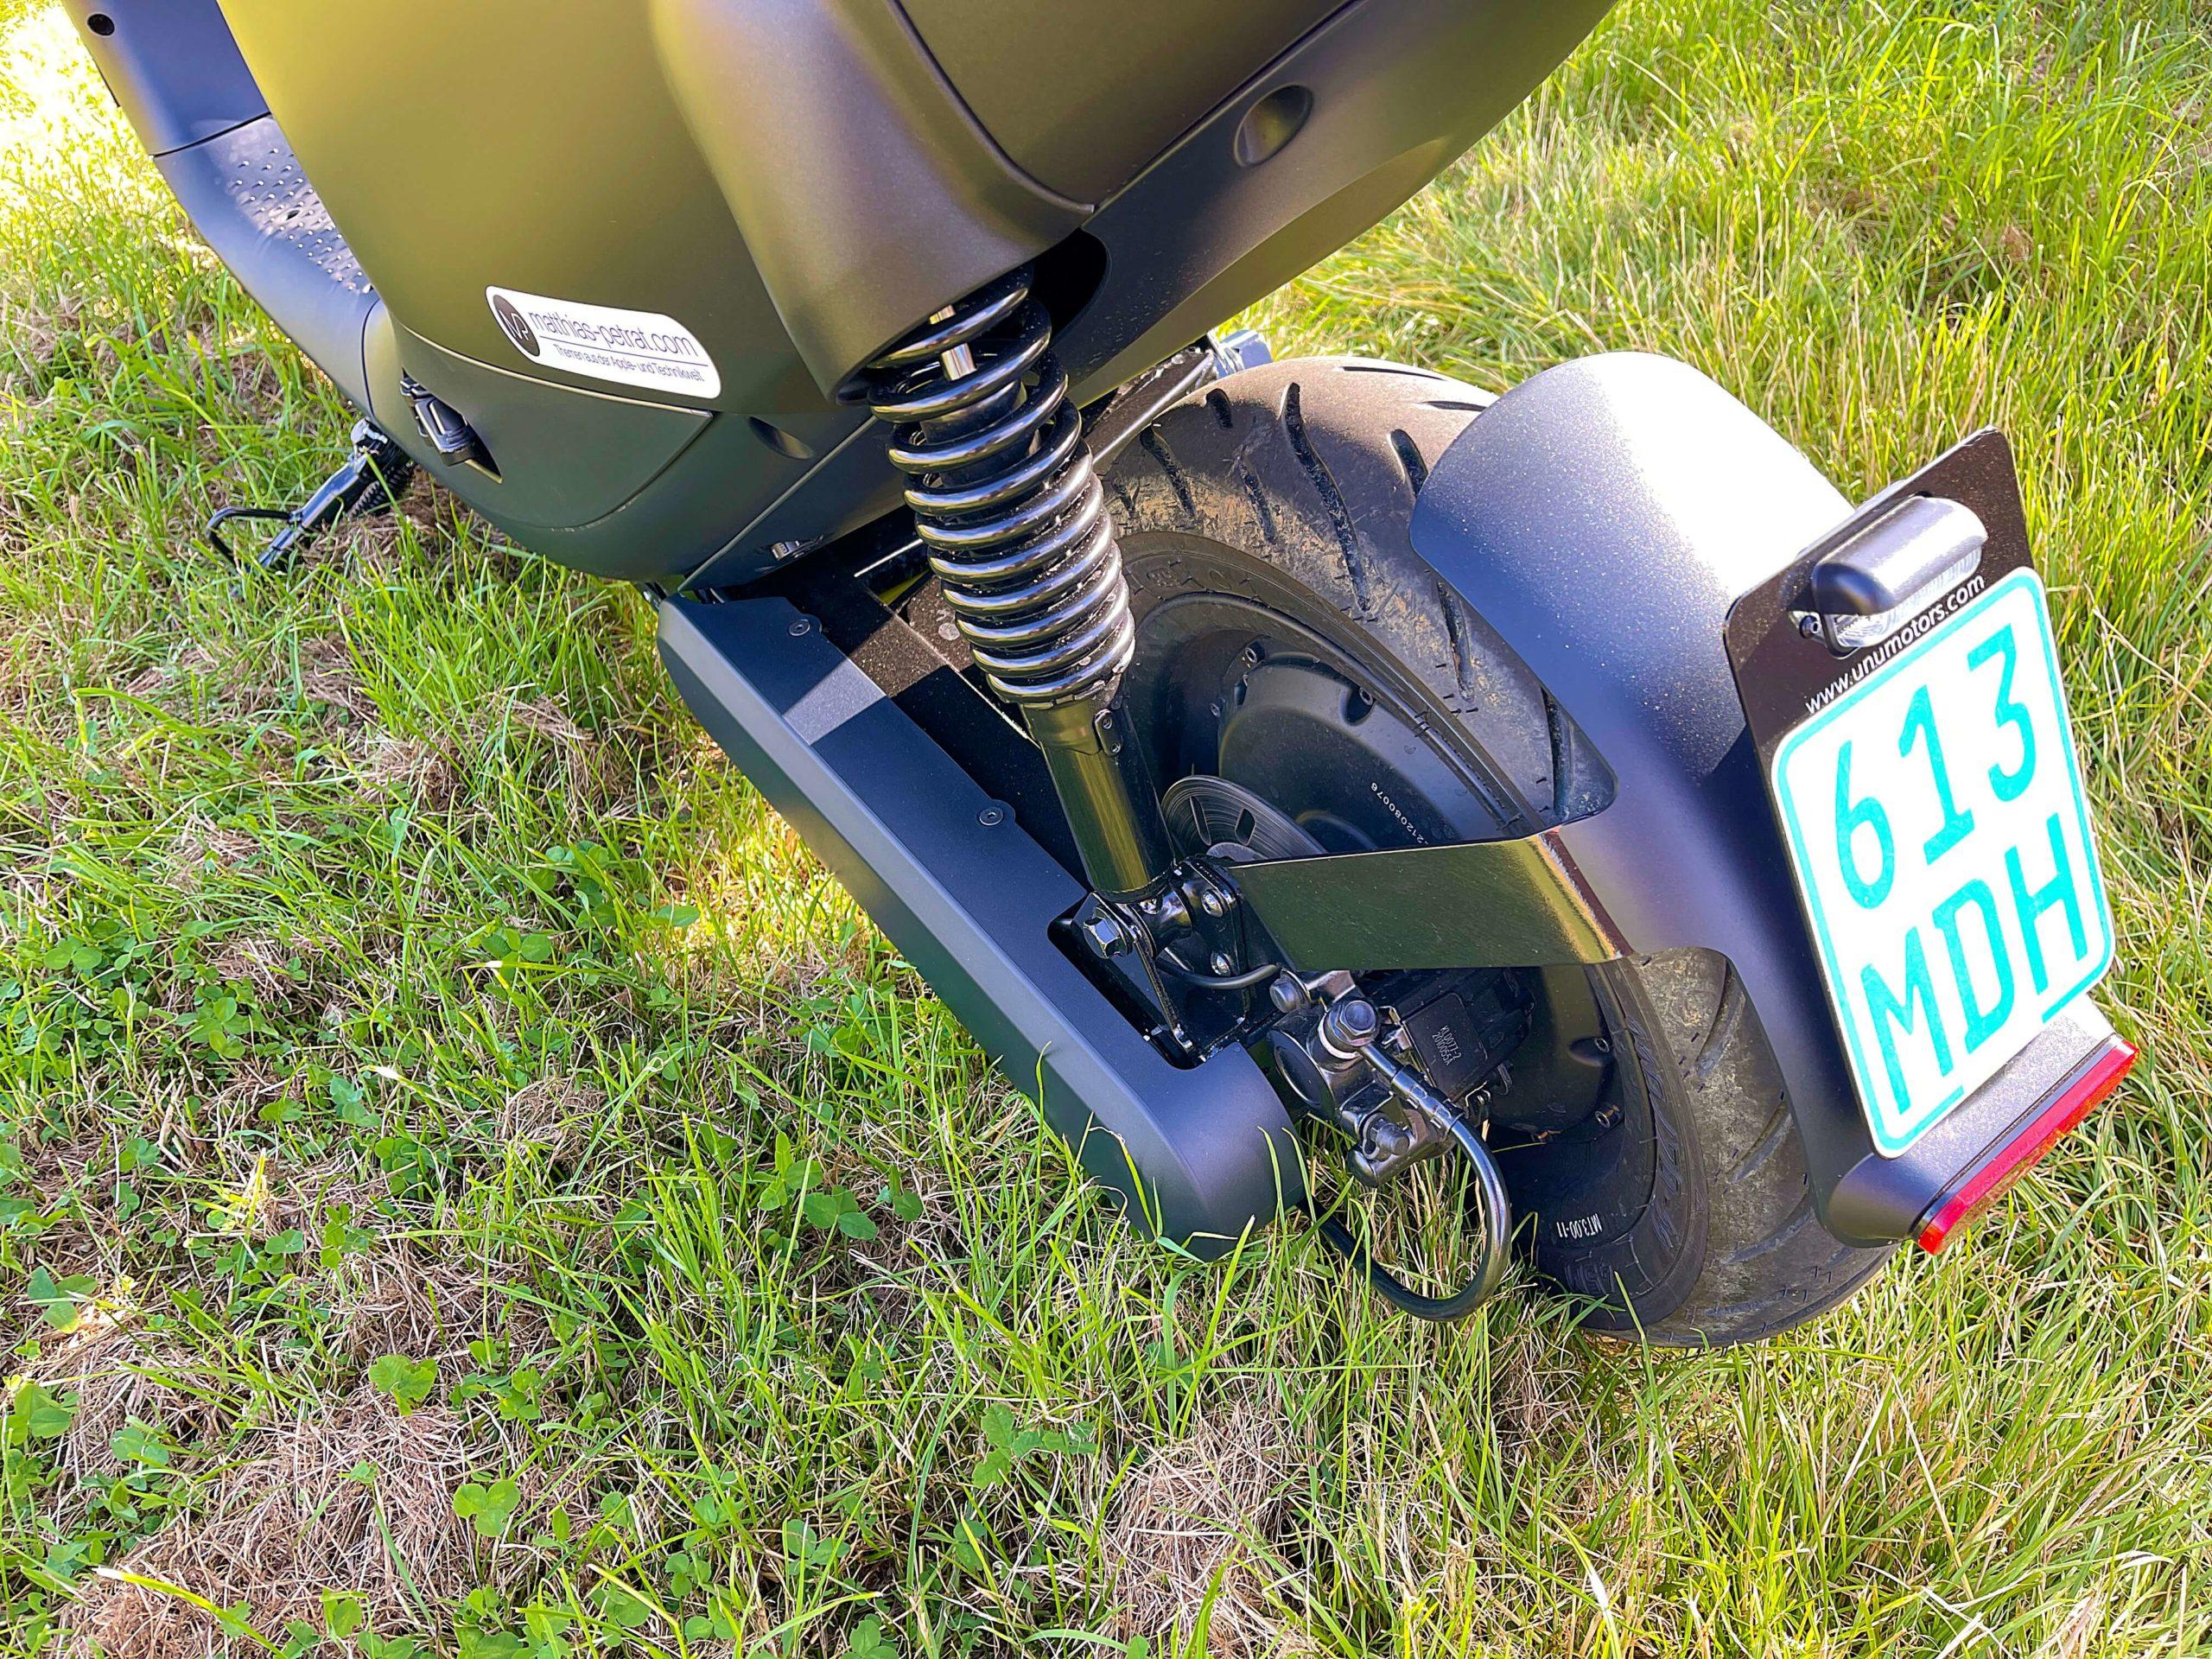 Unu-Scooter-der-smarte-Elektroroller-aus-Berlin13-scaled Unu Scooter - der smarte Elektroroller aus Berlin